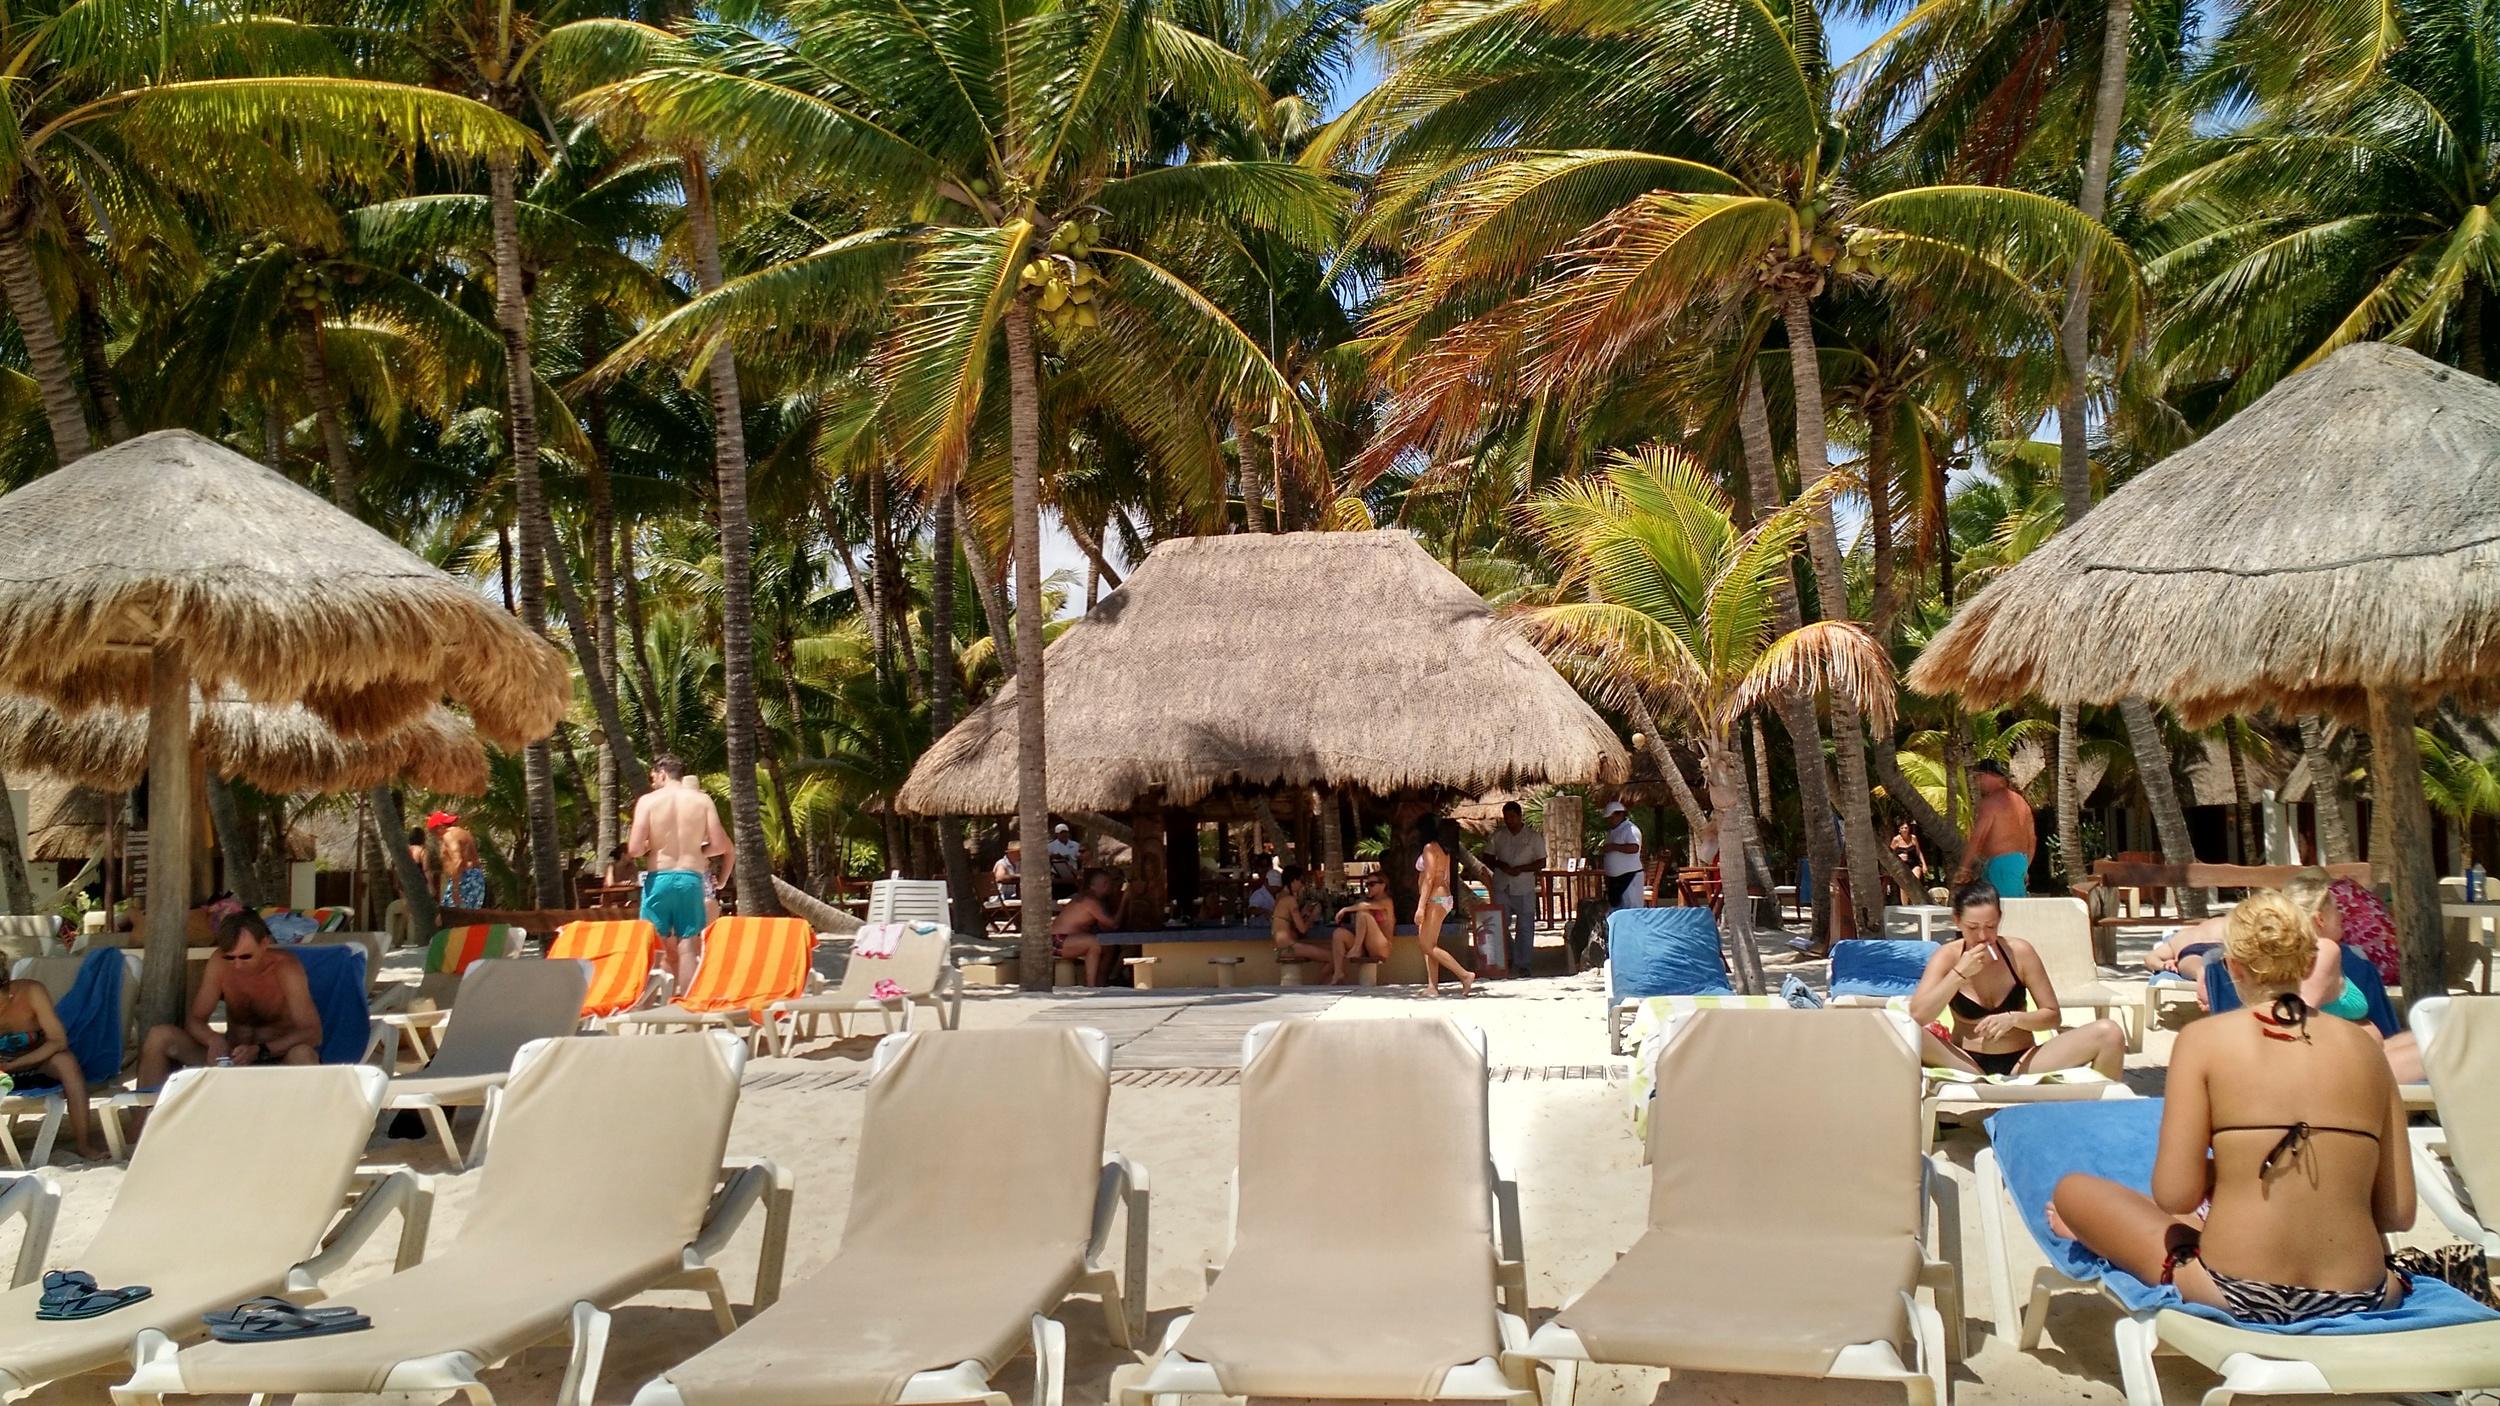 One of Playa's manybeachside resorts